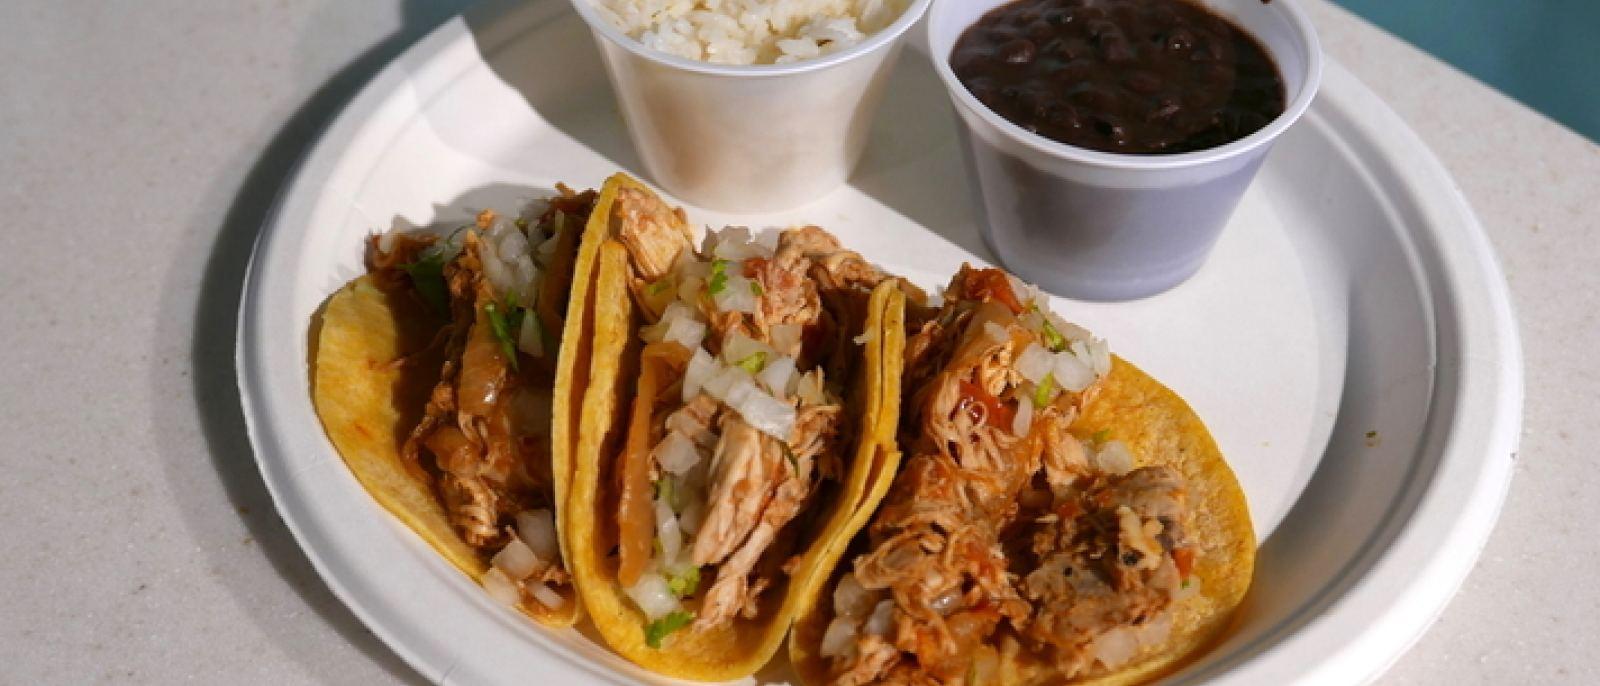 Chicken tinga three-taco platter at Loteria Grill, LAX Terminal 7